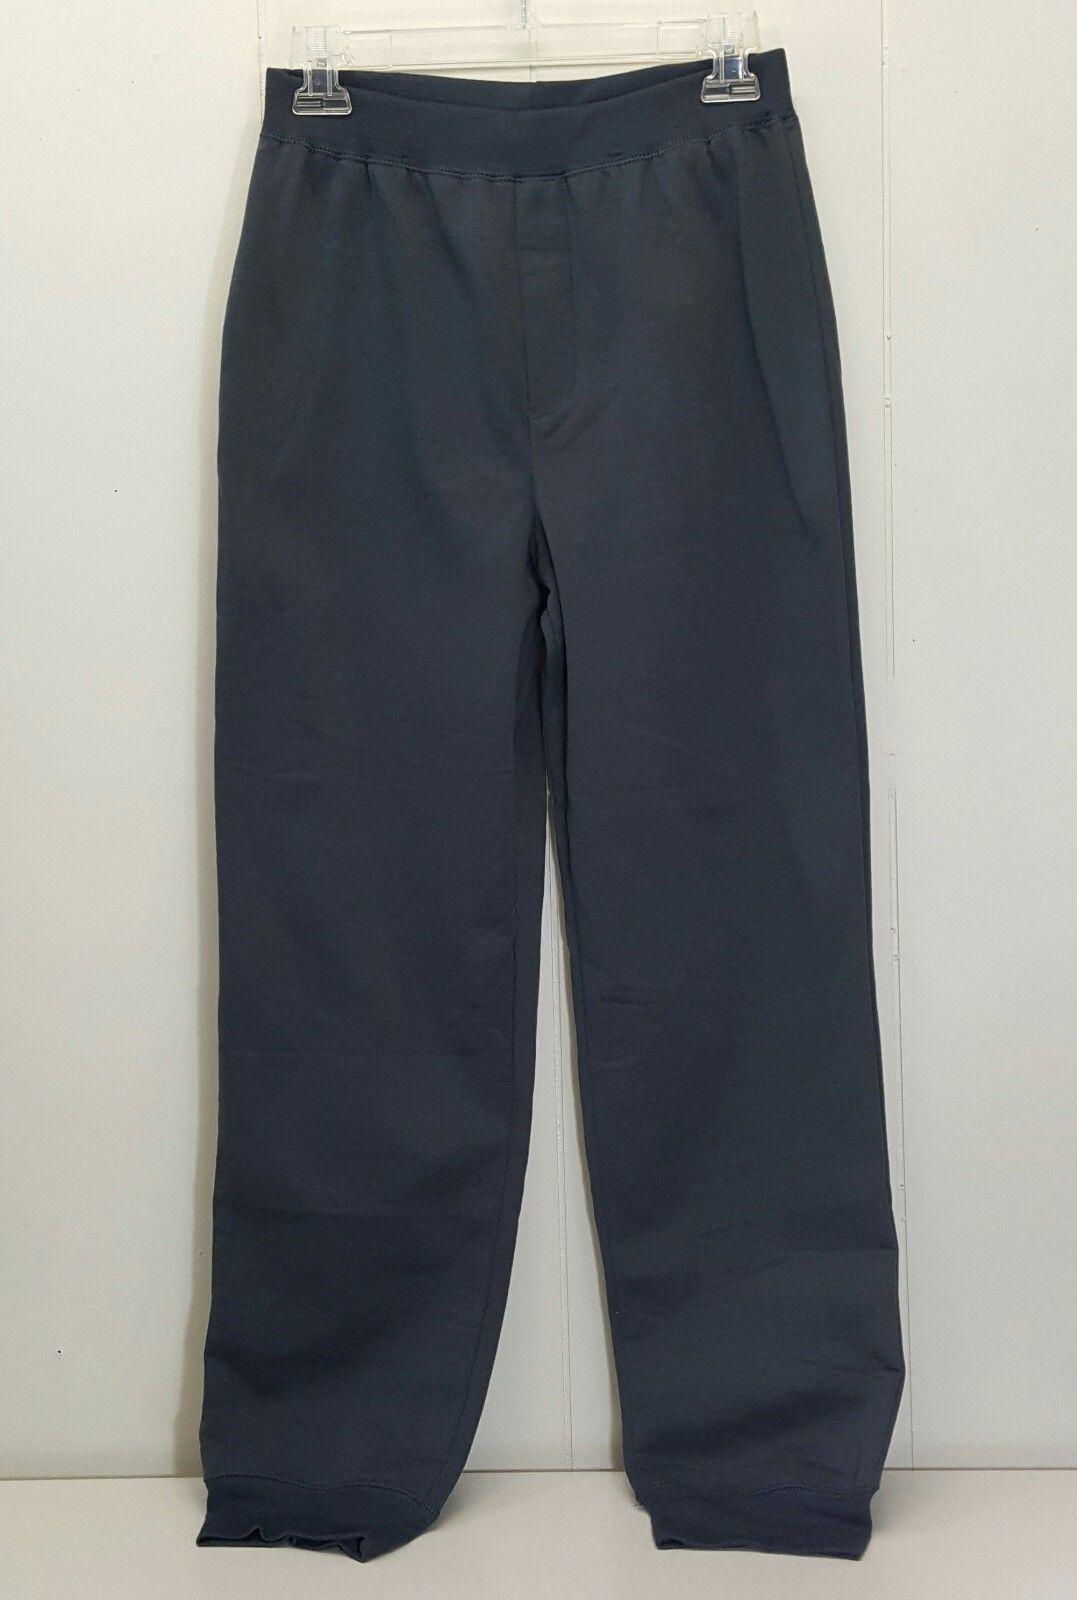 St Eve LARGE Pajama Set 3 Pc Born to Ride Shirt Pants NEW Red Gray Bear 14 16